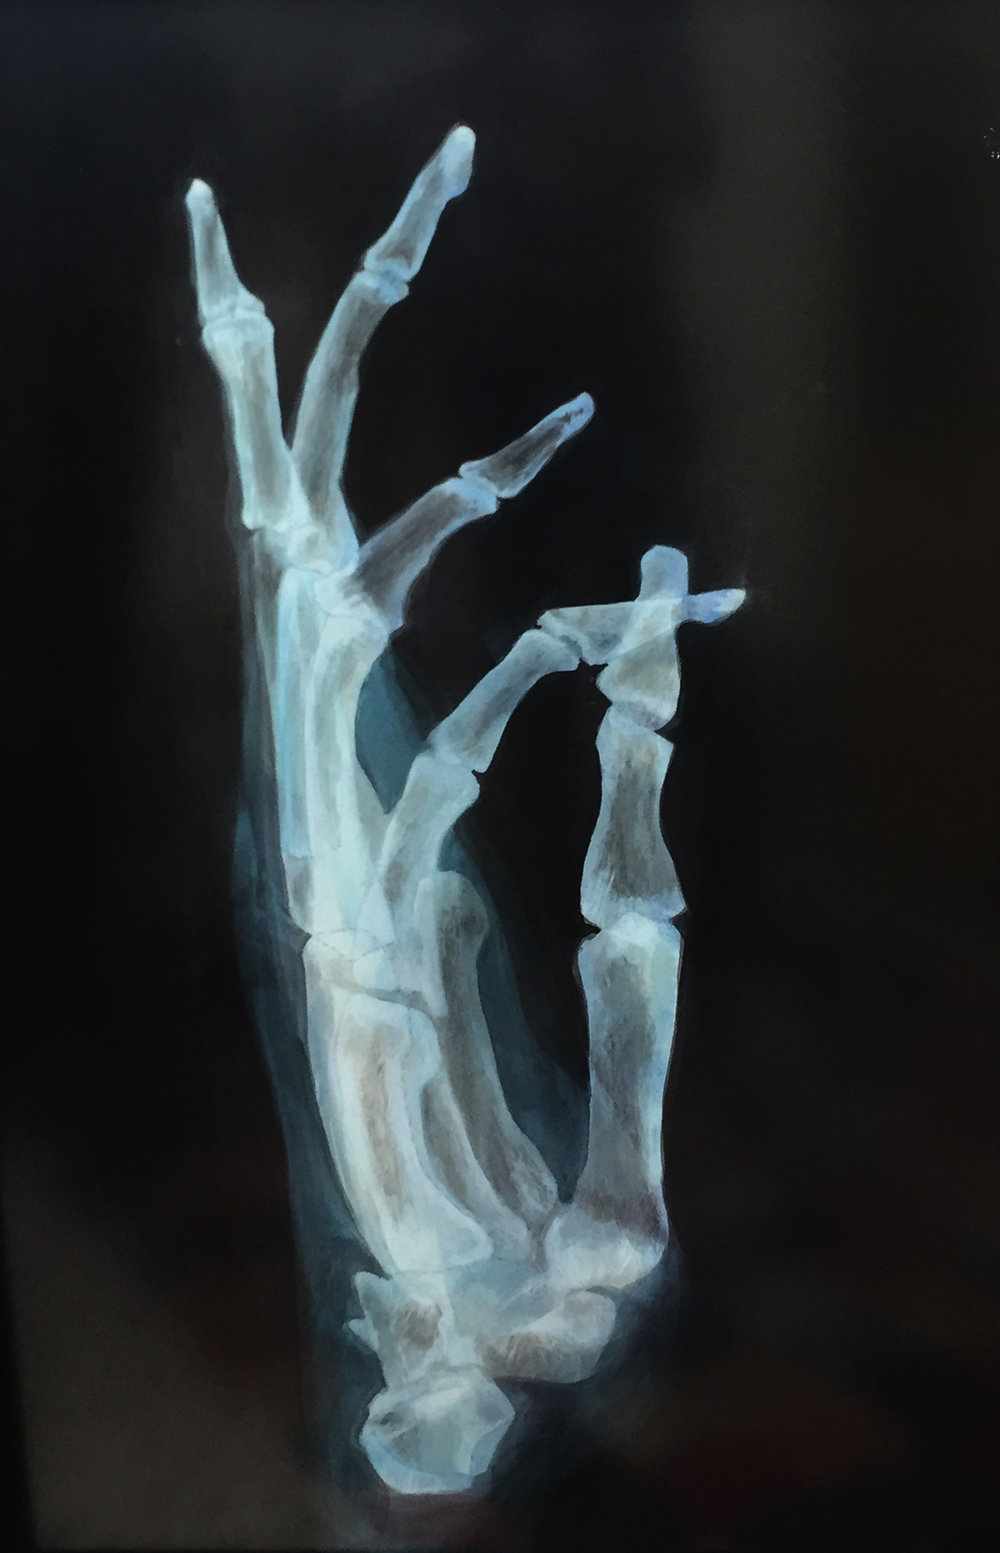 Ed Aulerich-Sugai , Xray  series, 1980. Acrylic. 45 x 30 inches.